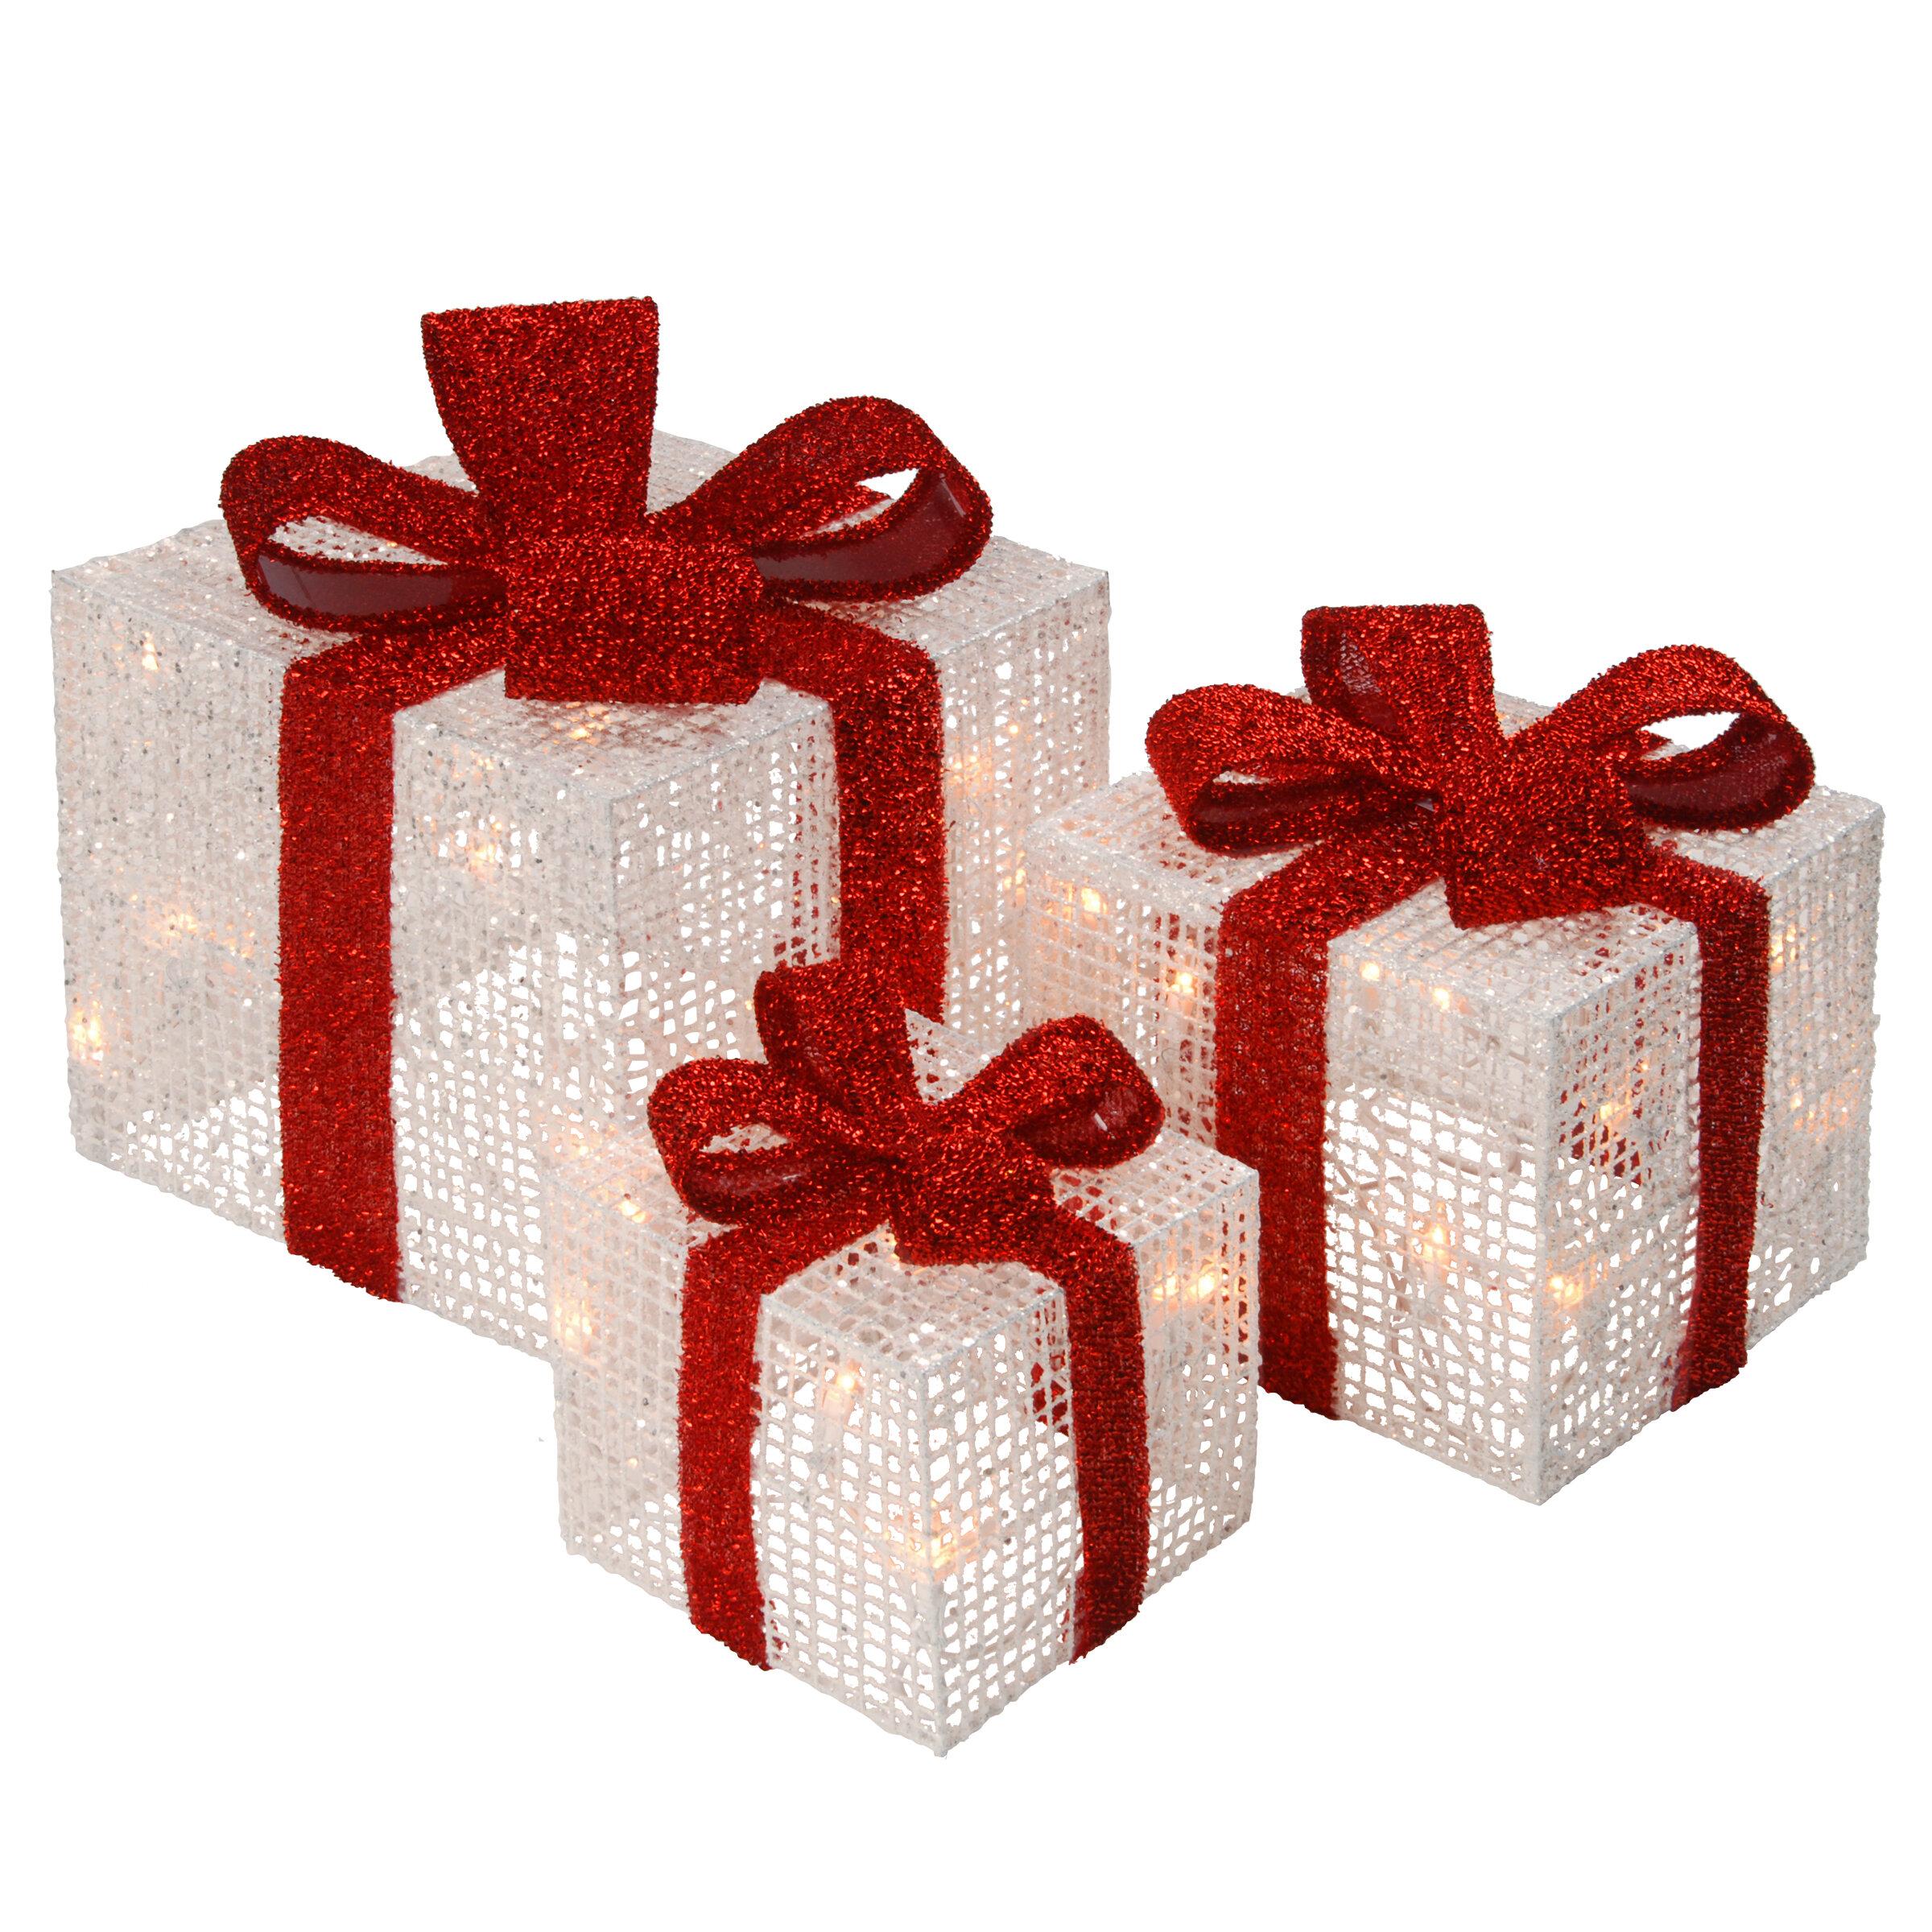 Hashtag Home 3 Piece White Thread Gift Box Lighted Display Reviews Wayfair